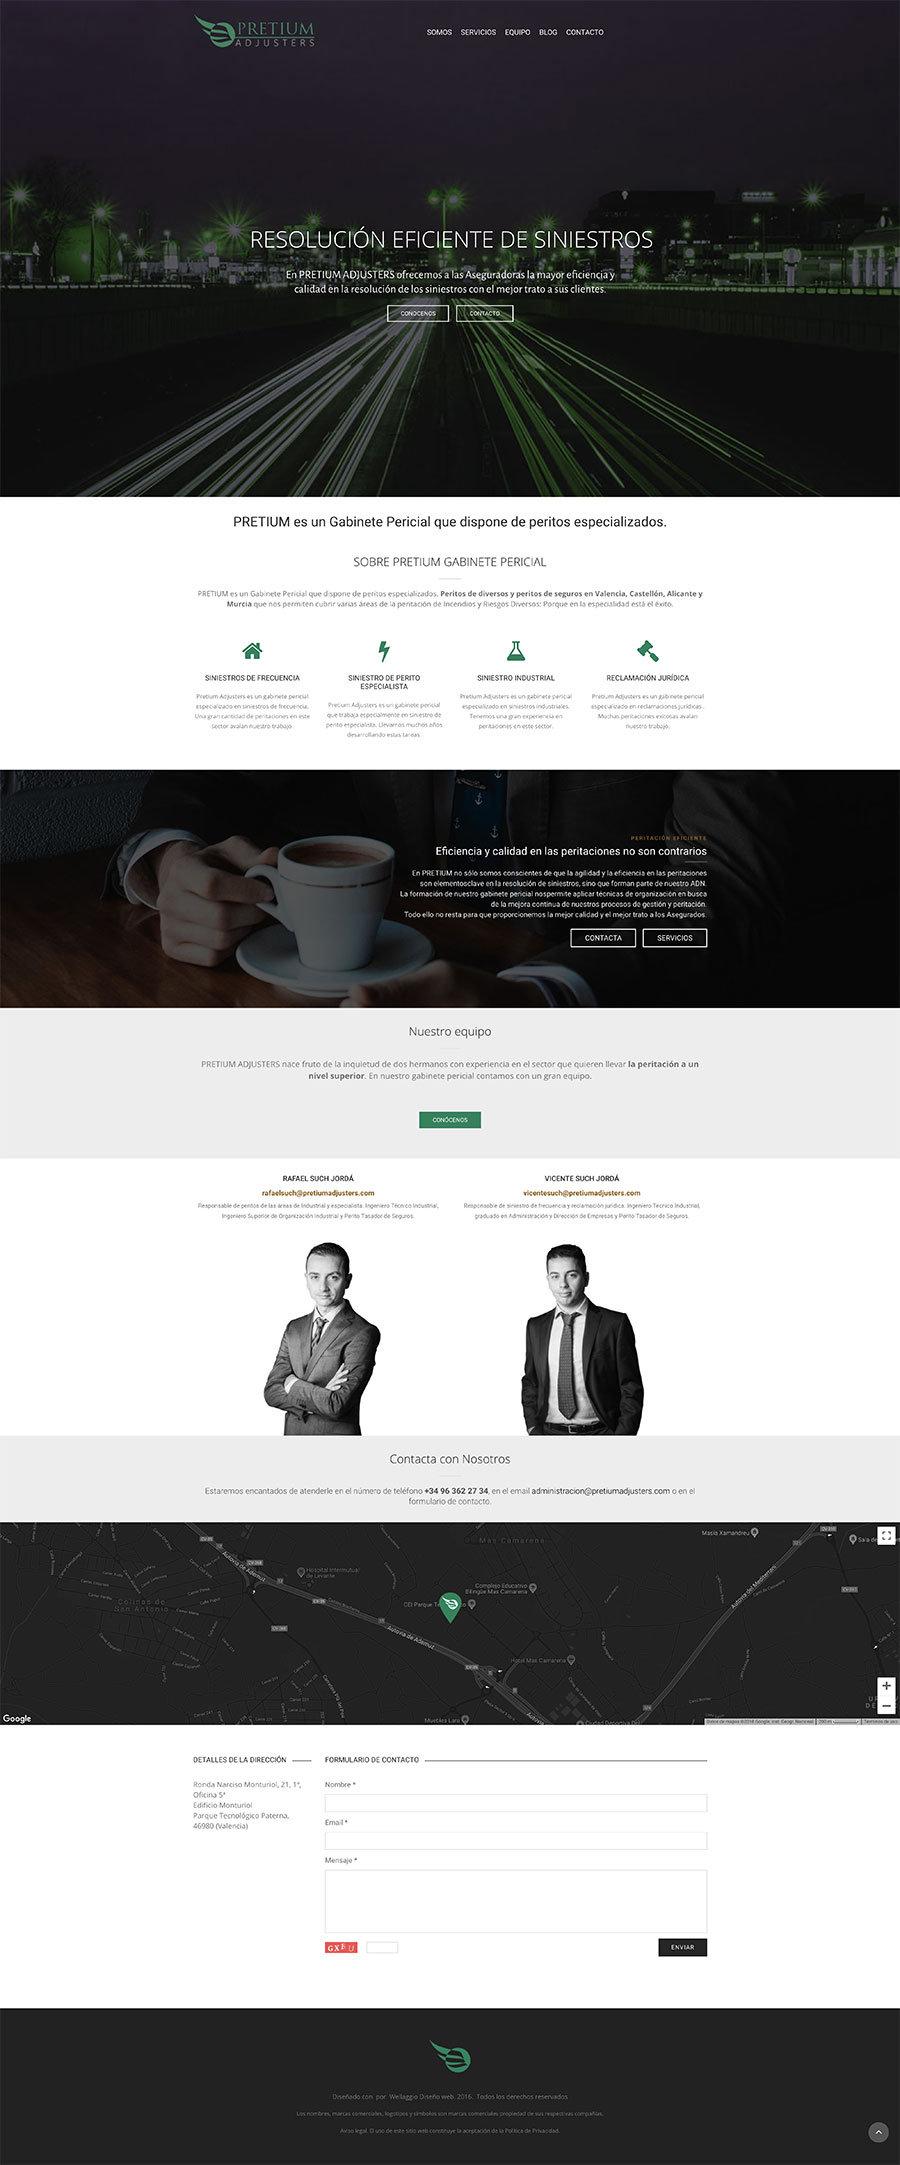 Wellaggio-diseño-web-valencia-pretiumadjusters-2018-08-16-17_16_59